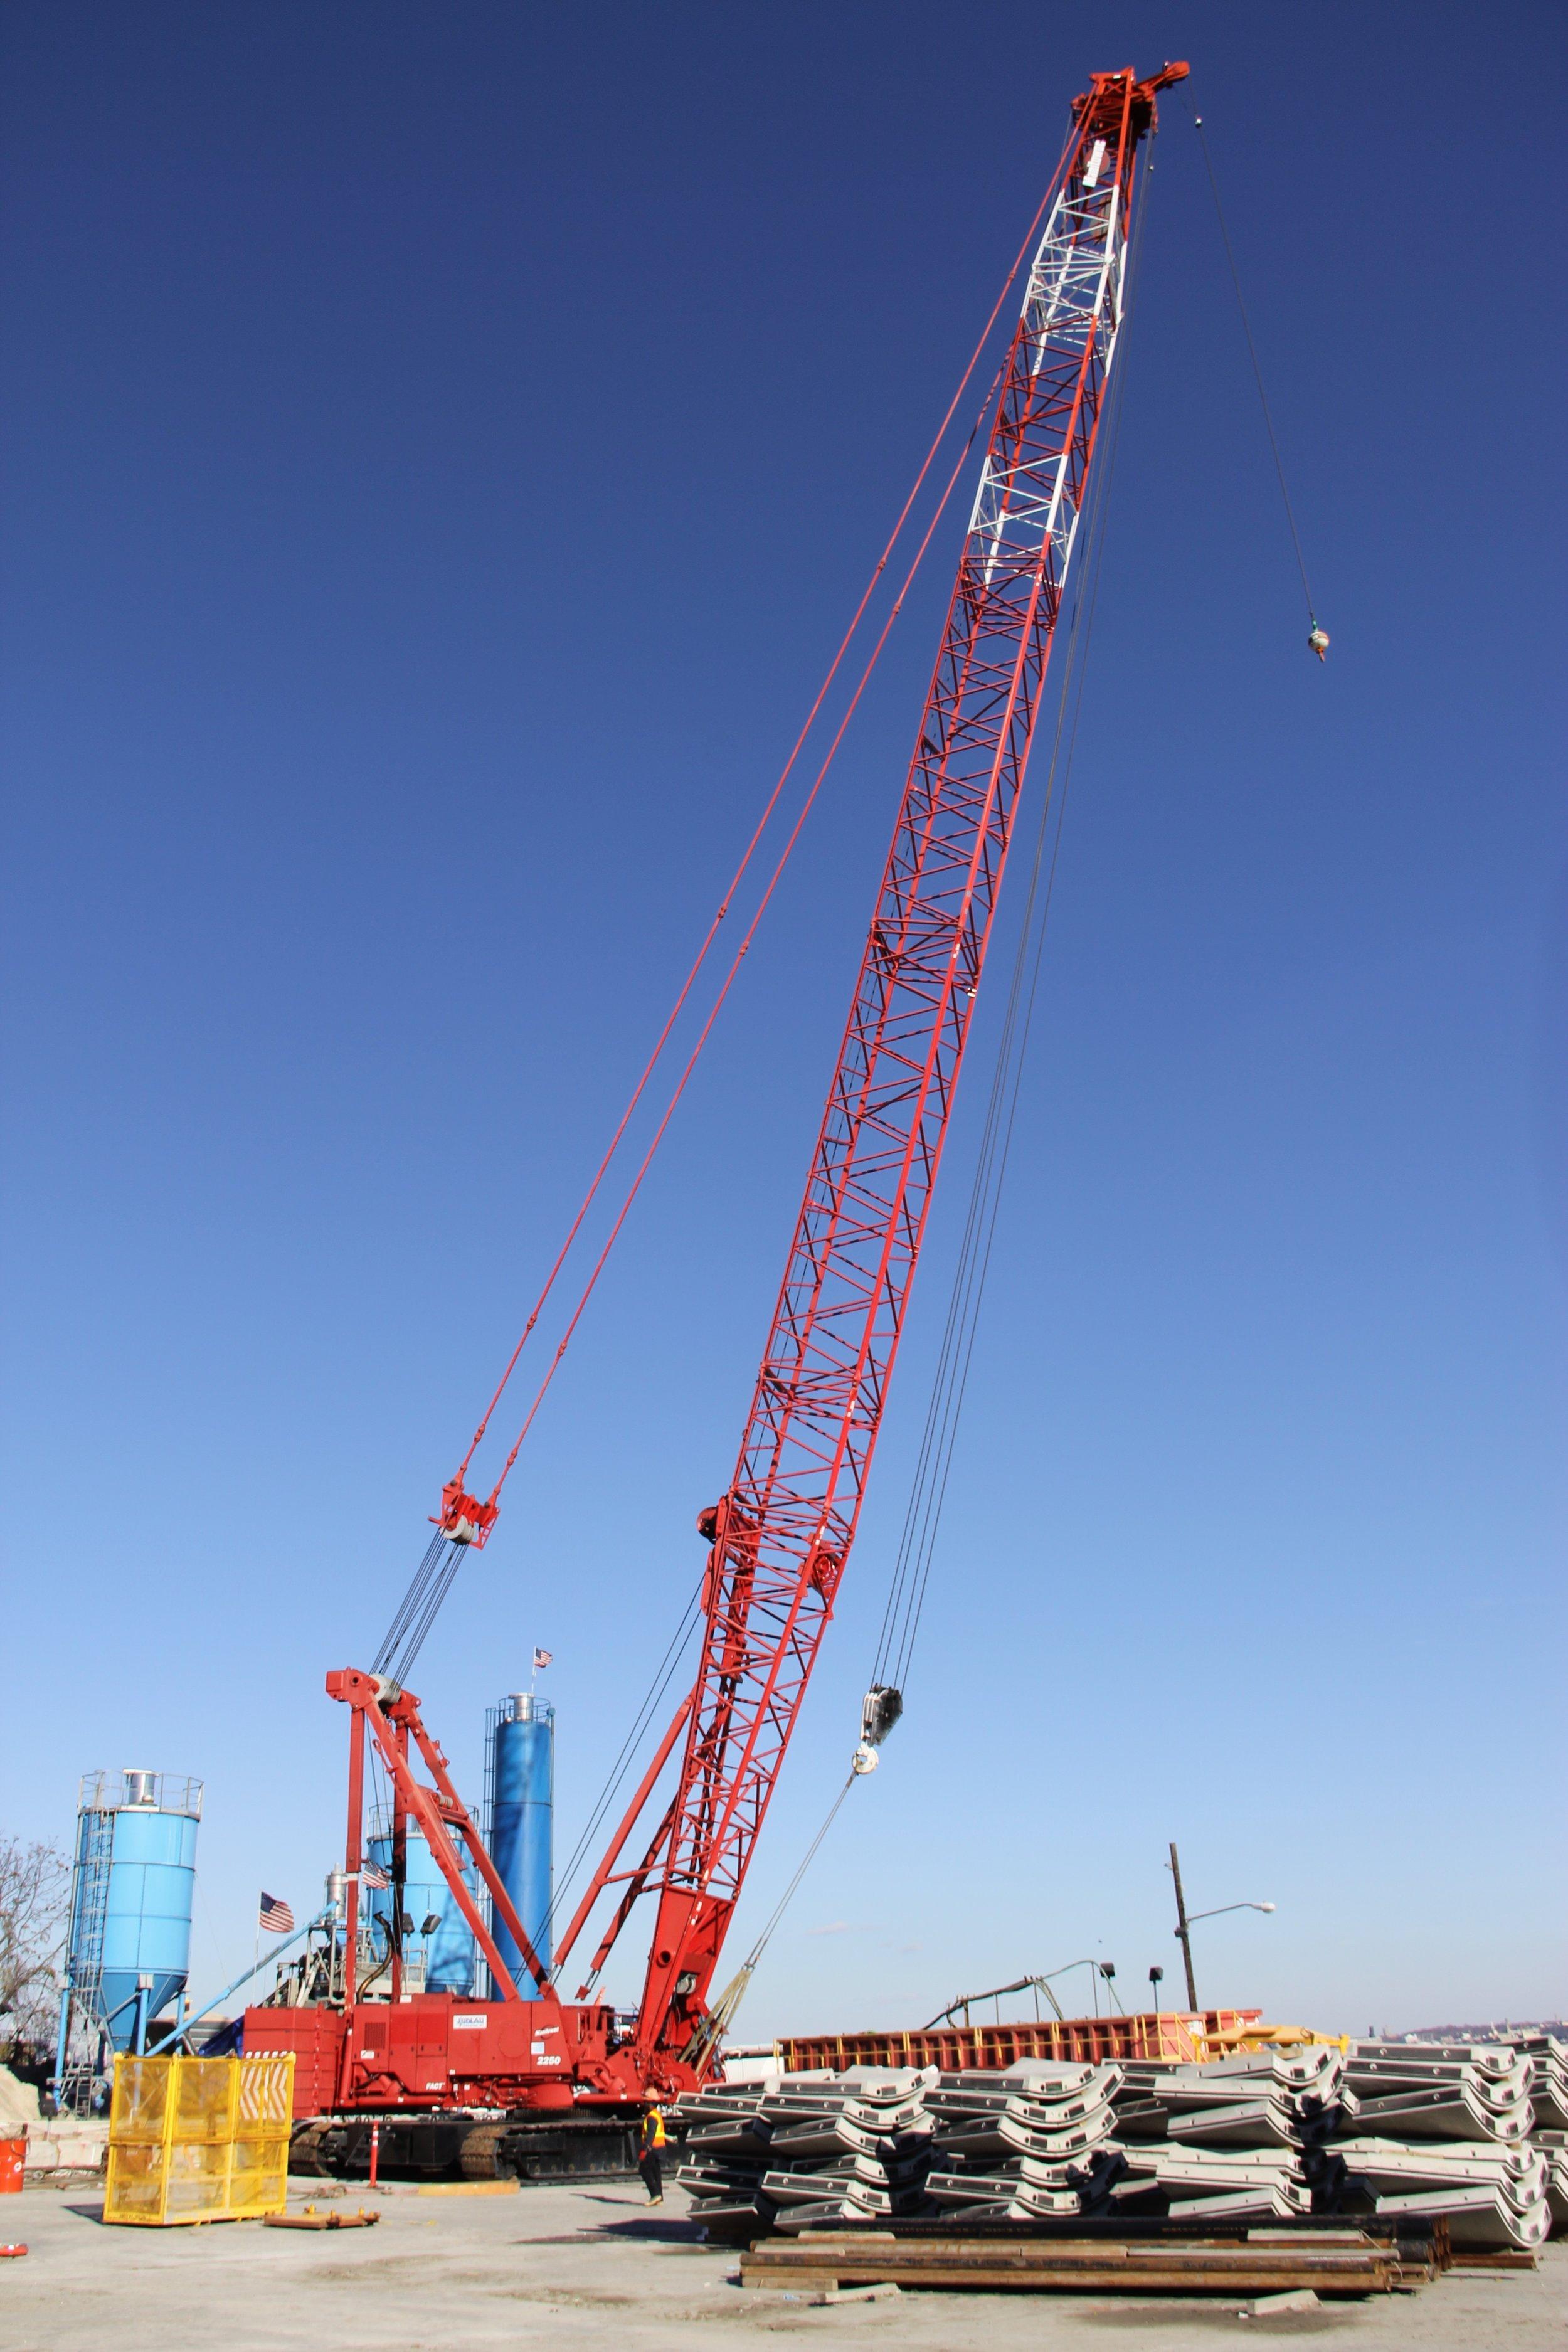 Crawler cranes - Ranging from 85-440 tons